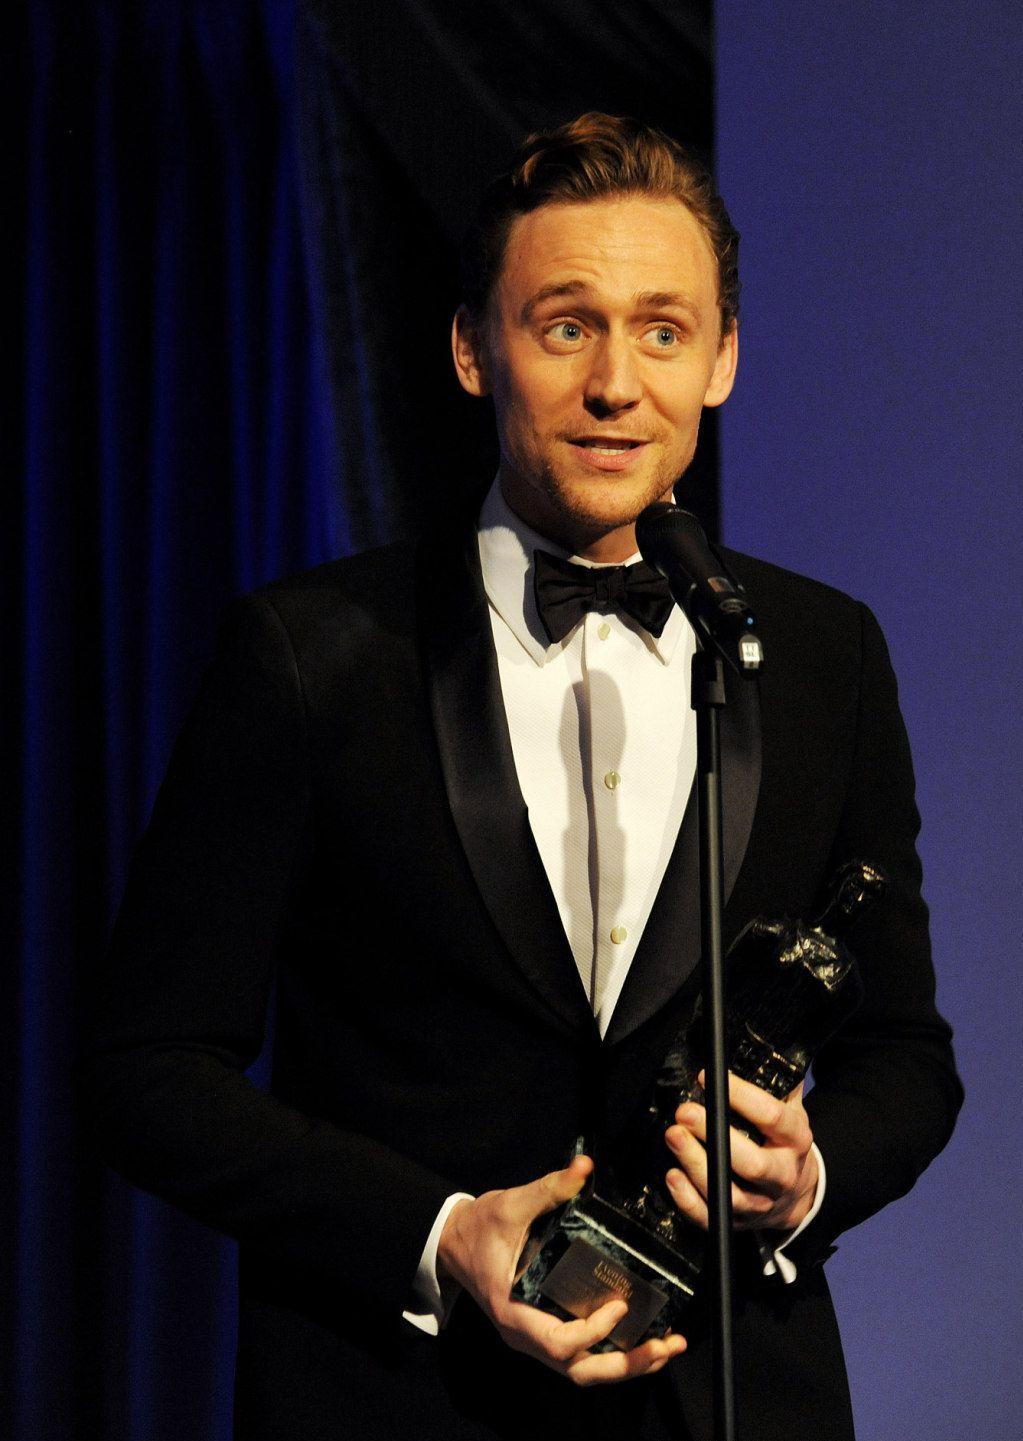 Tom Hiddleston at the 59th London Evening Standard Theatre Awards on November 17, 2013